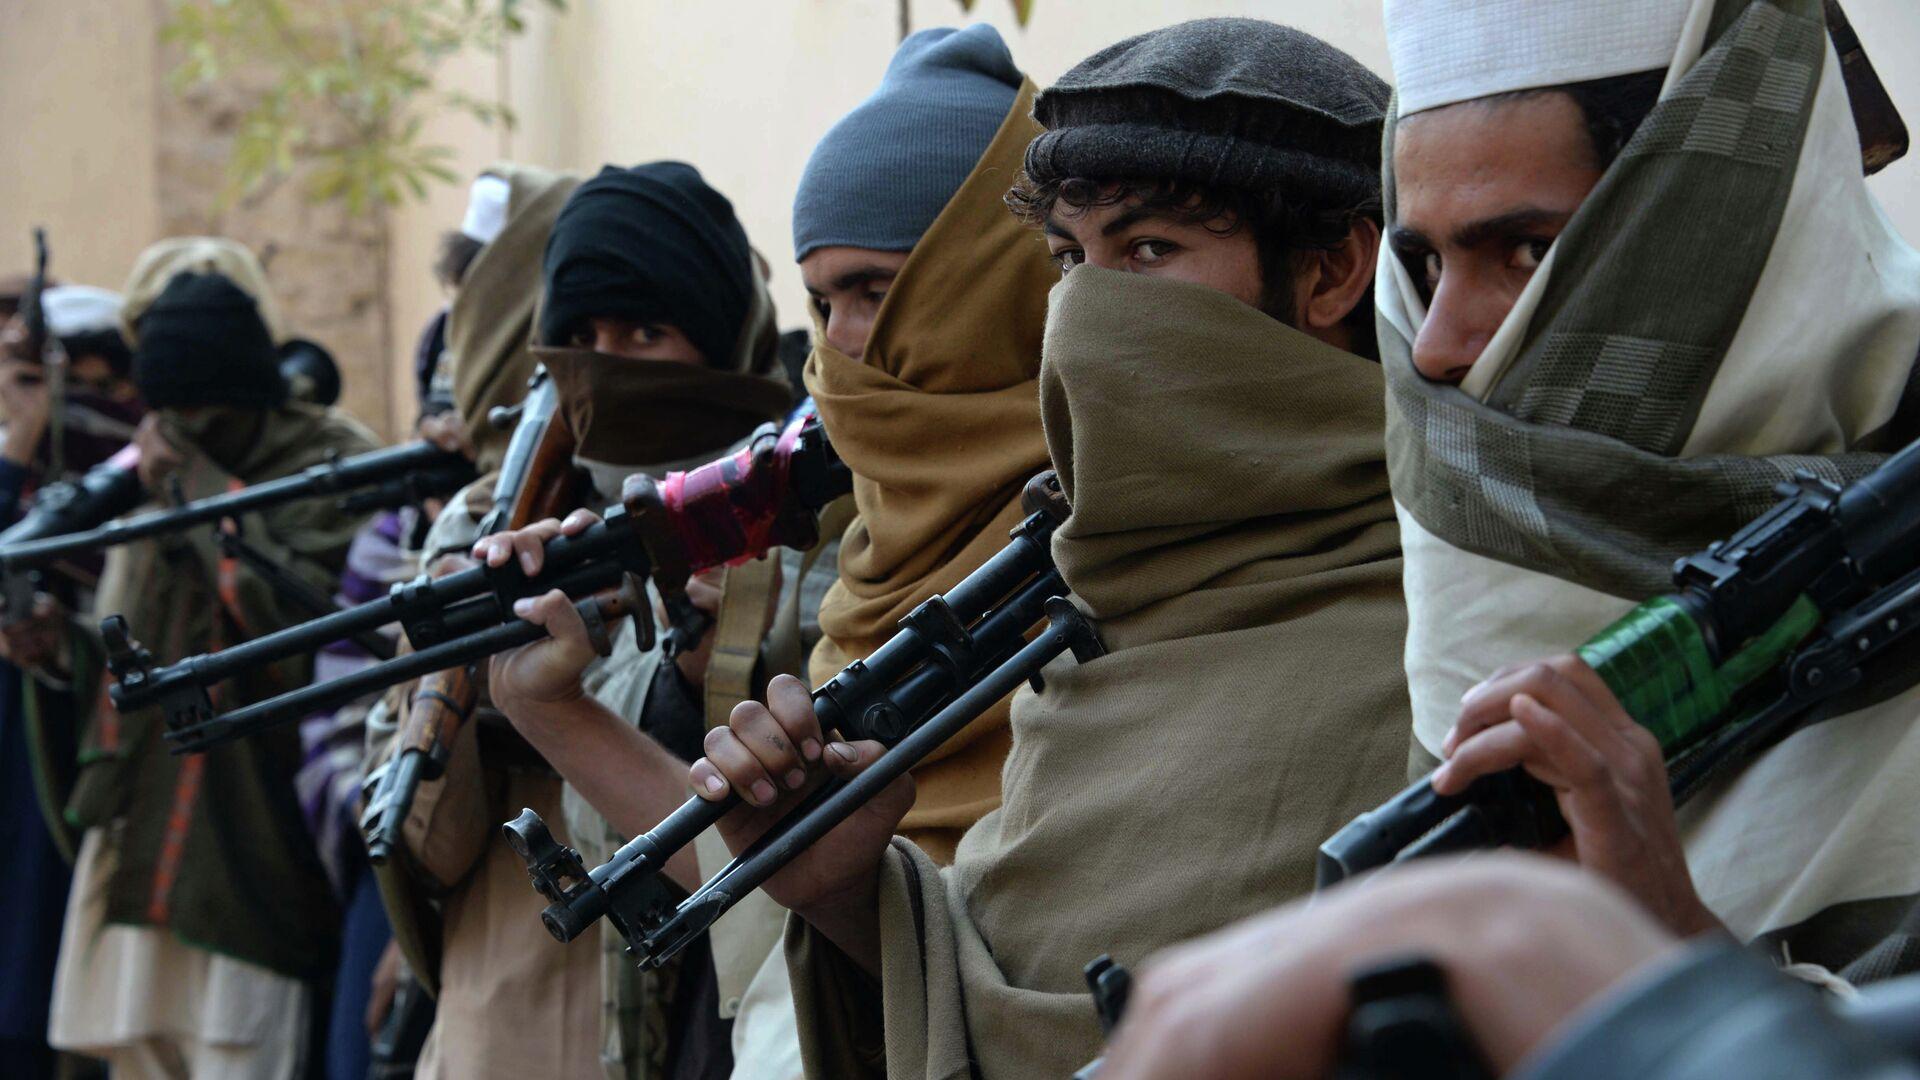 Combatientes de Talibán en Afganistán - Sputnik Mundo, 1920, 18.07.2021